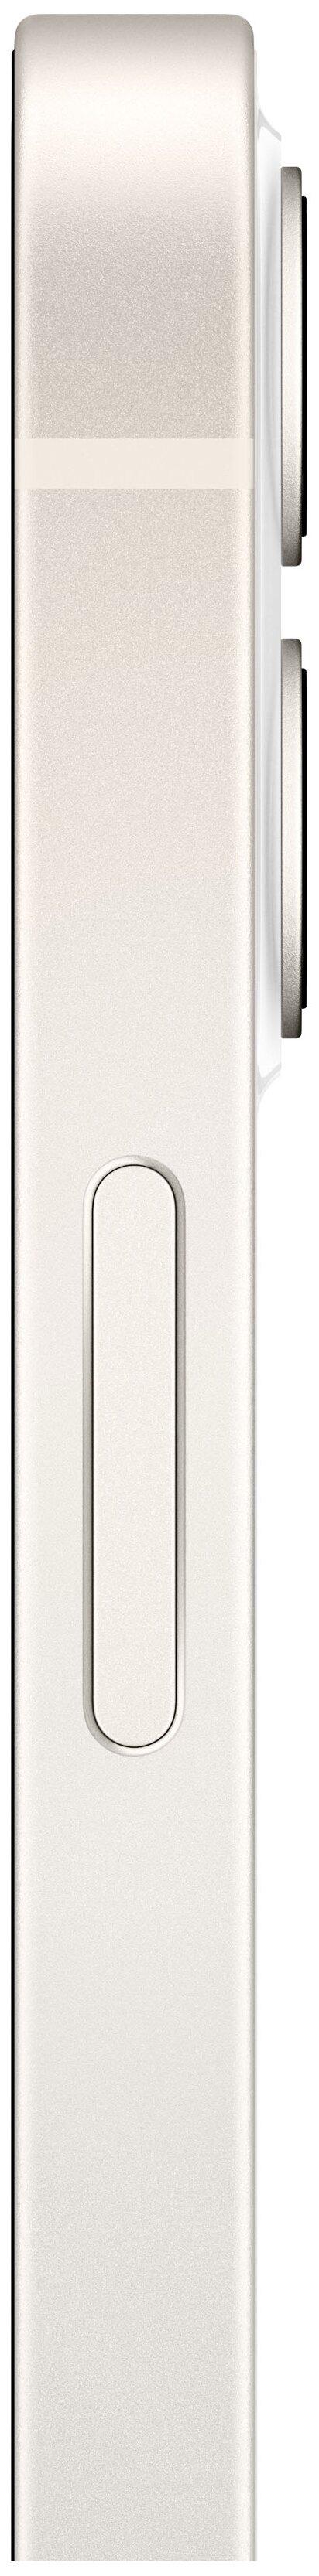 Apple iPhone 12 mini 256GB - процессор: Apple A14Bionic